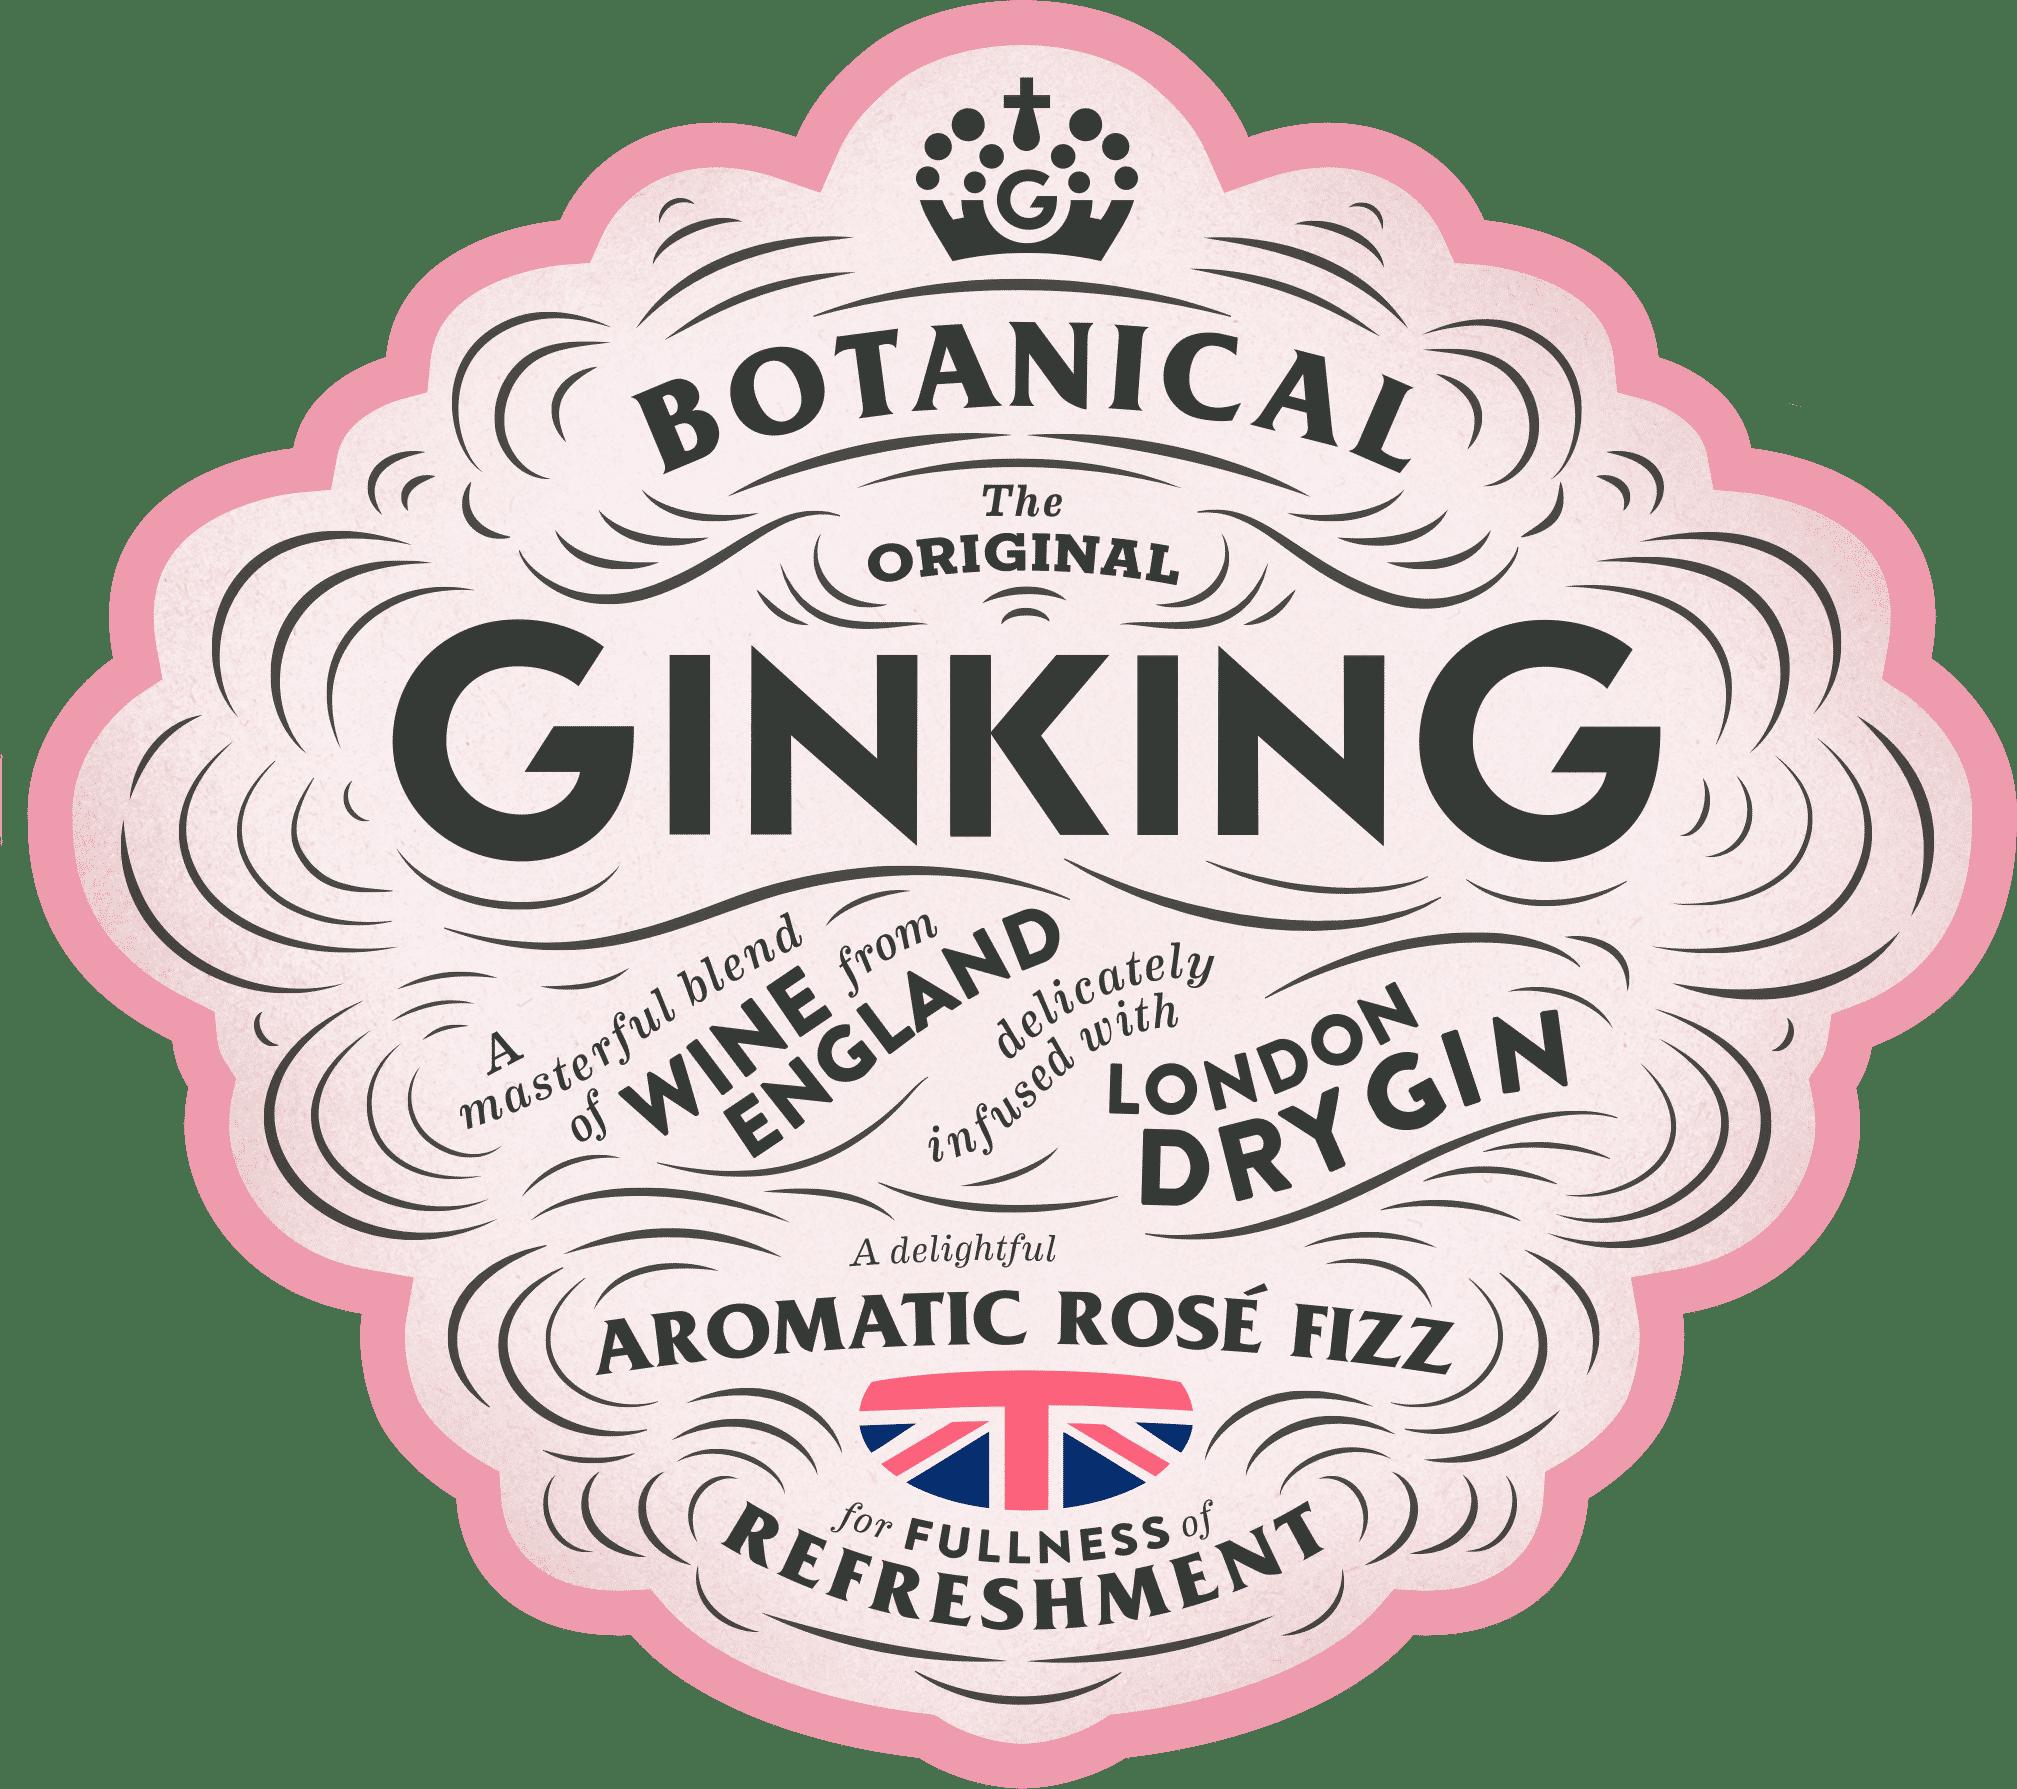 Gin King Bottle Rose